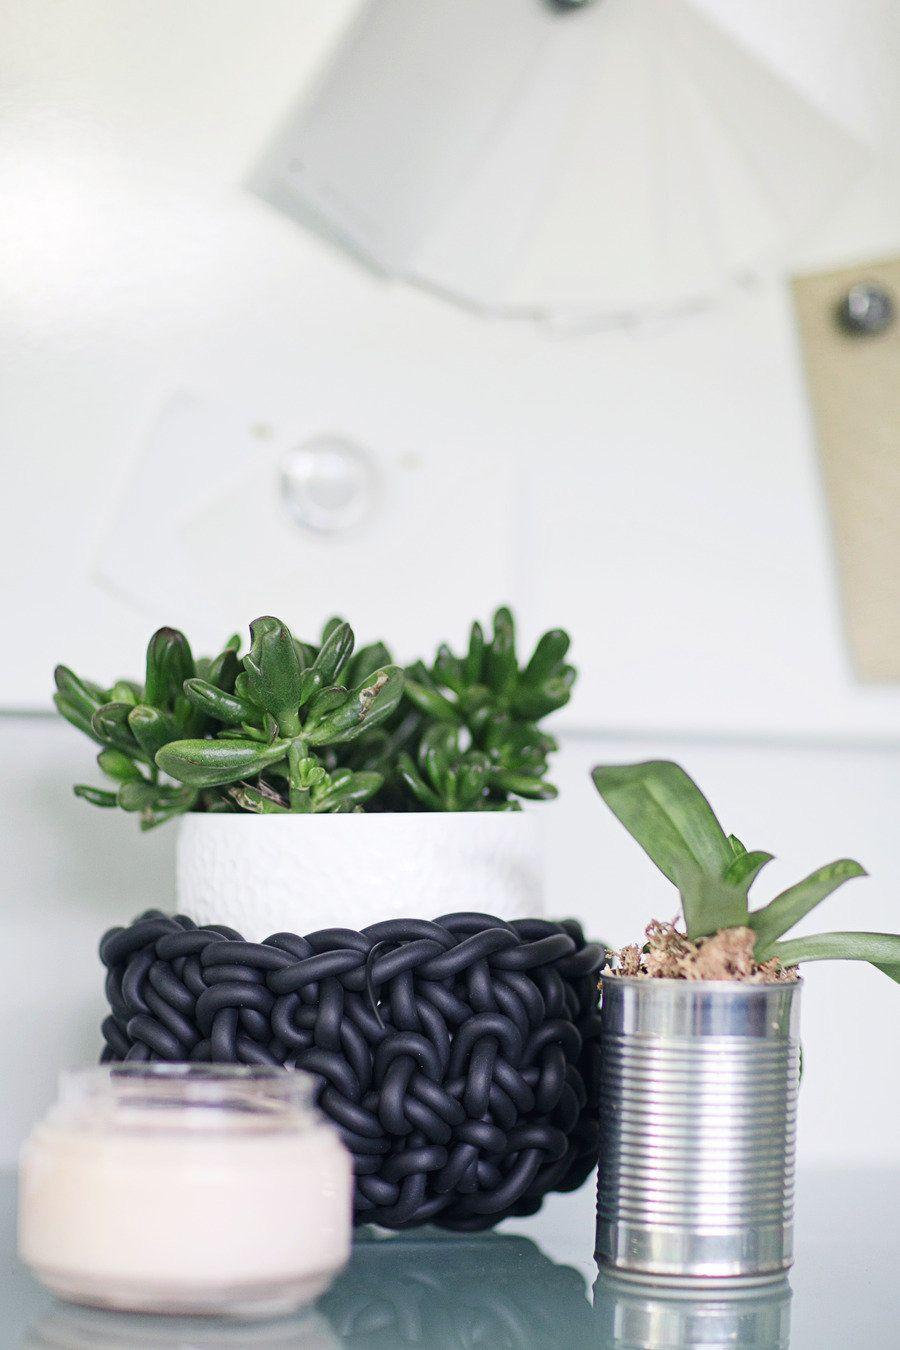 tin can as a planter #potted-plants, #plants  Photography: Heidi Geldhauser - ourlaboroflovebyheidi.com/ Design & Styling: Christina Loucks - christinaloucks.wordpress.com/  Read More: http://www.stylemepretty.com/living/2013/07/08/christina-loucks-home-tour/